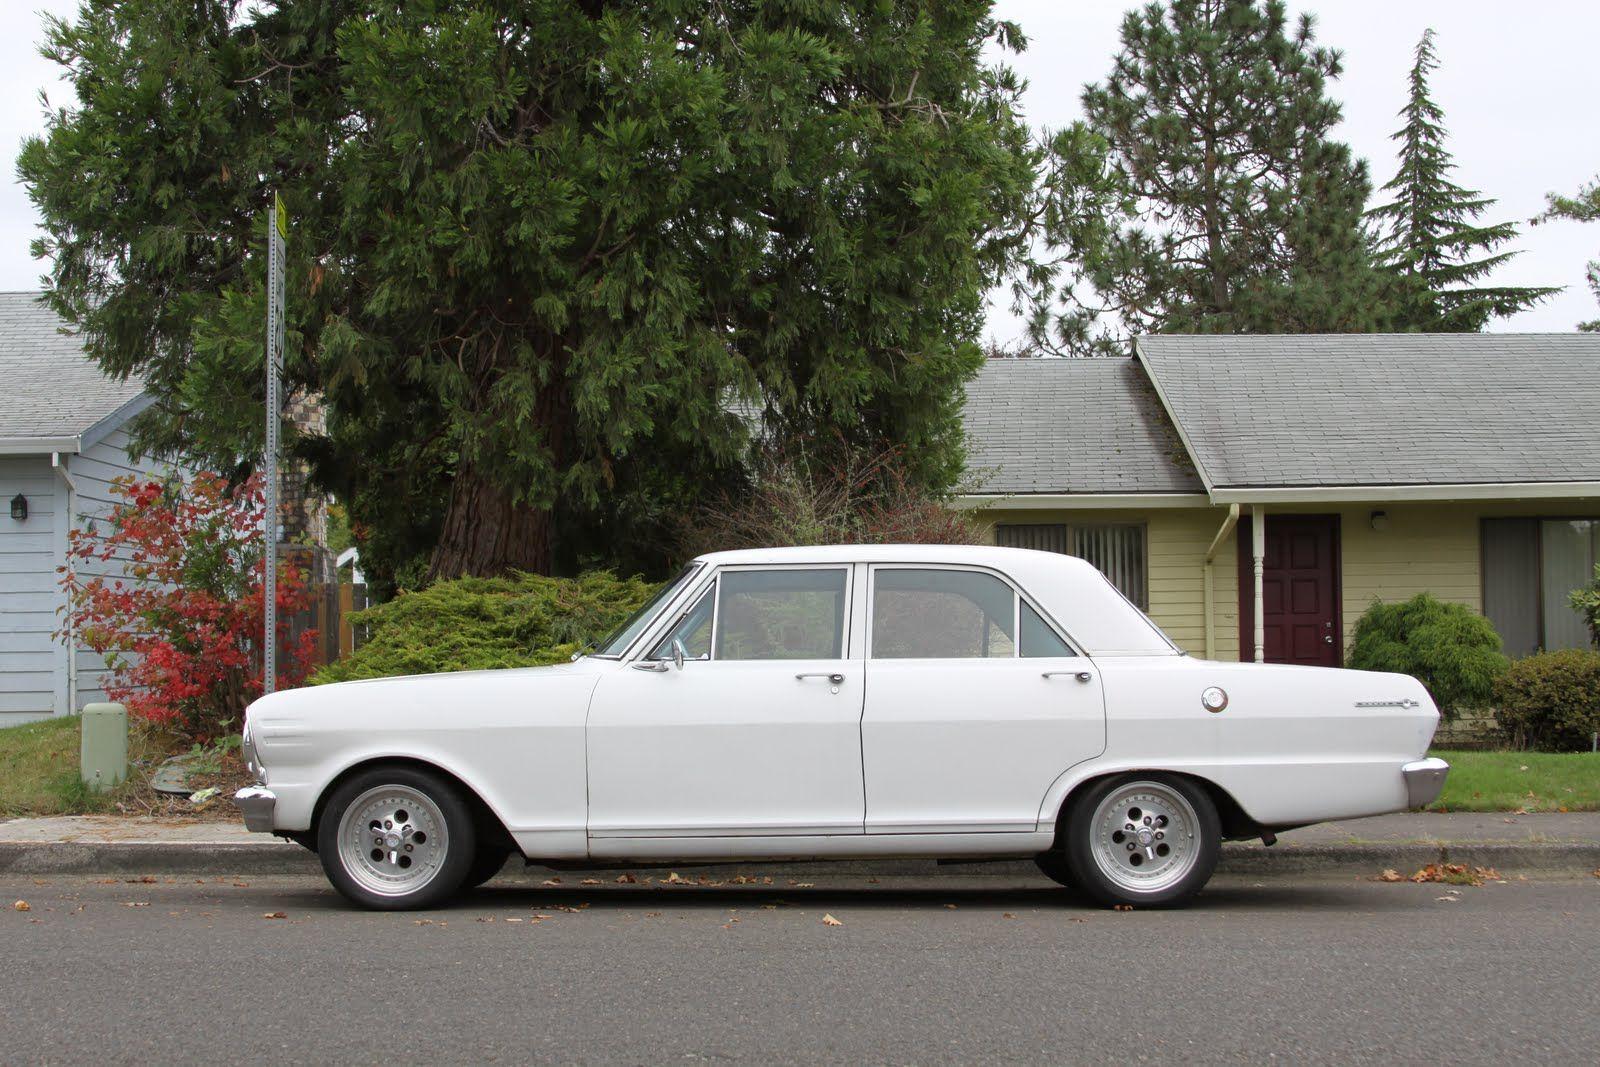 1965 Chevy Ii Nova Chevy Nova Chevy Chevrolet